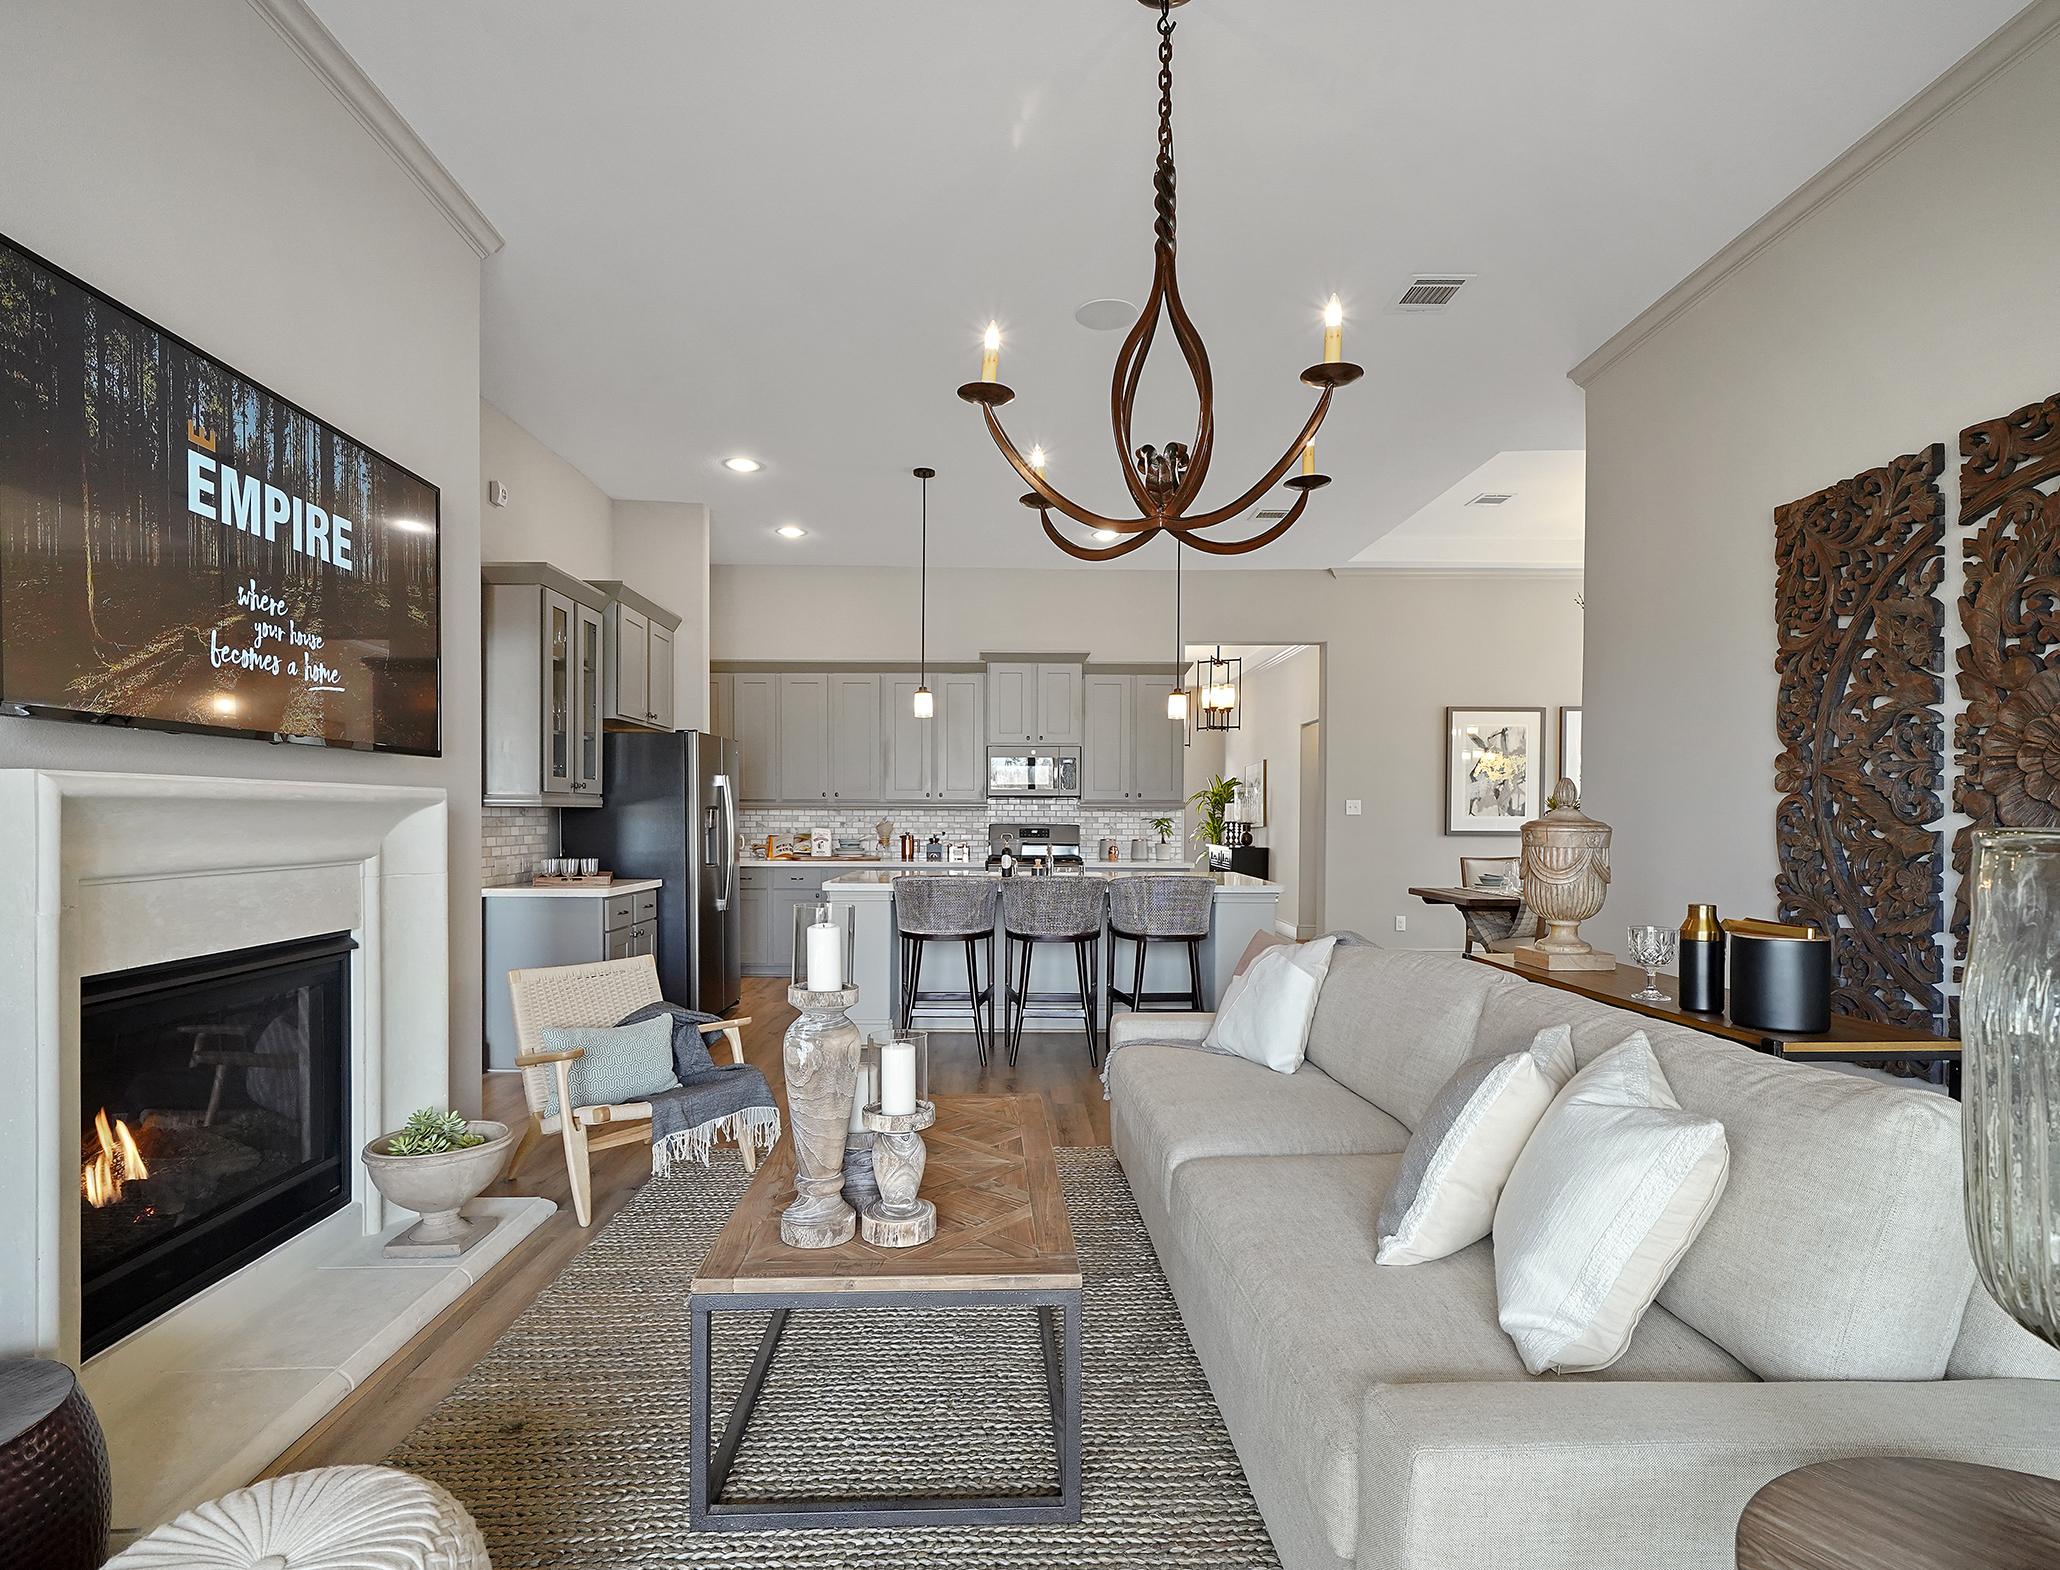 Empire Communities Celebrates Big Award Wins in the Texas Homebuilding Market